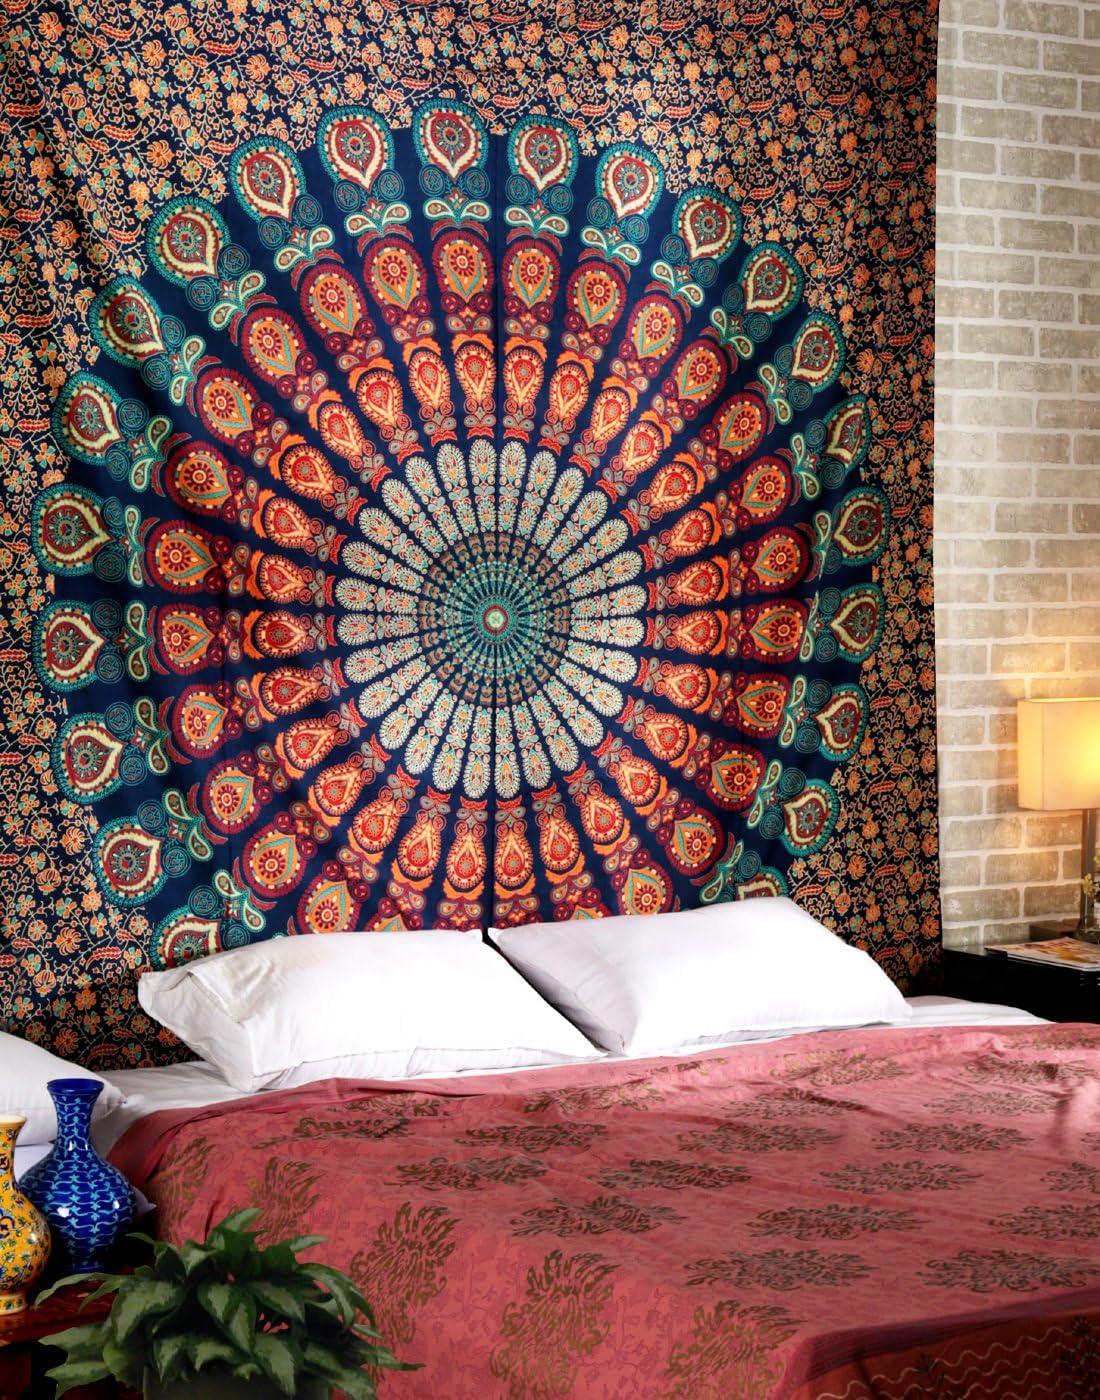 Peacock Mandala  Wall Hanging Bedspread Bedding Tapestry Beautiful Design Hippie